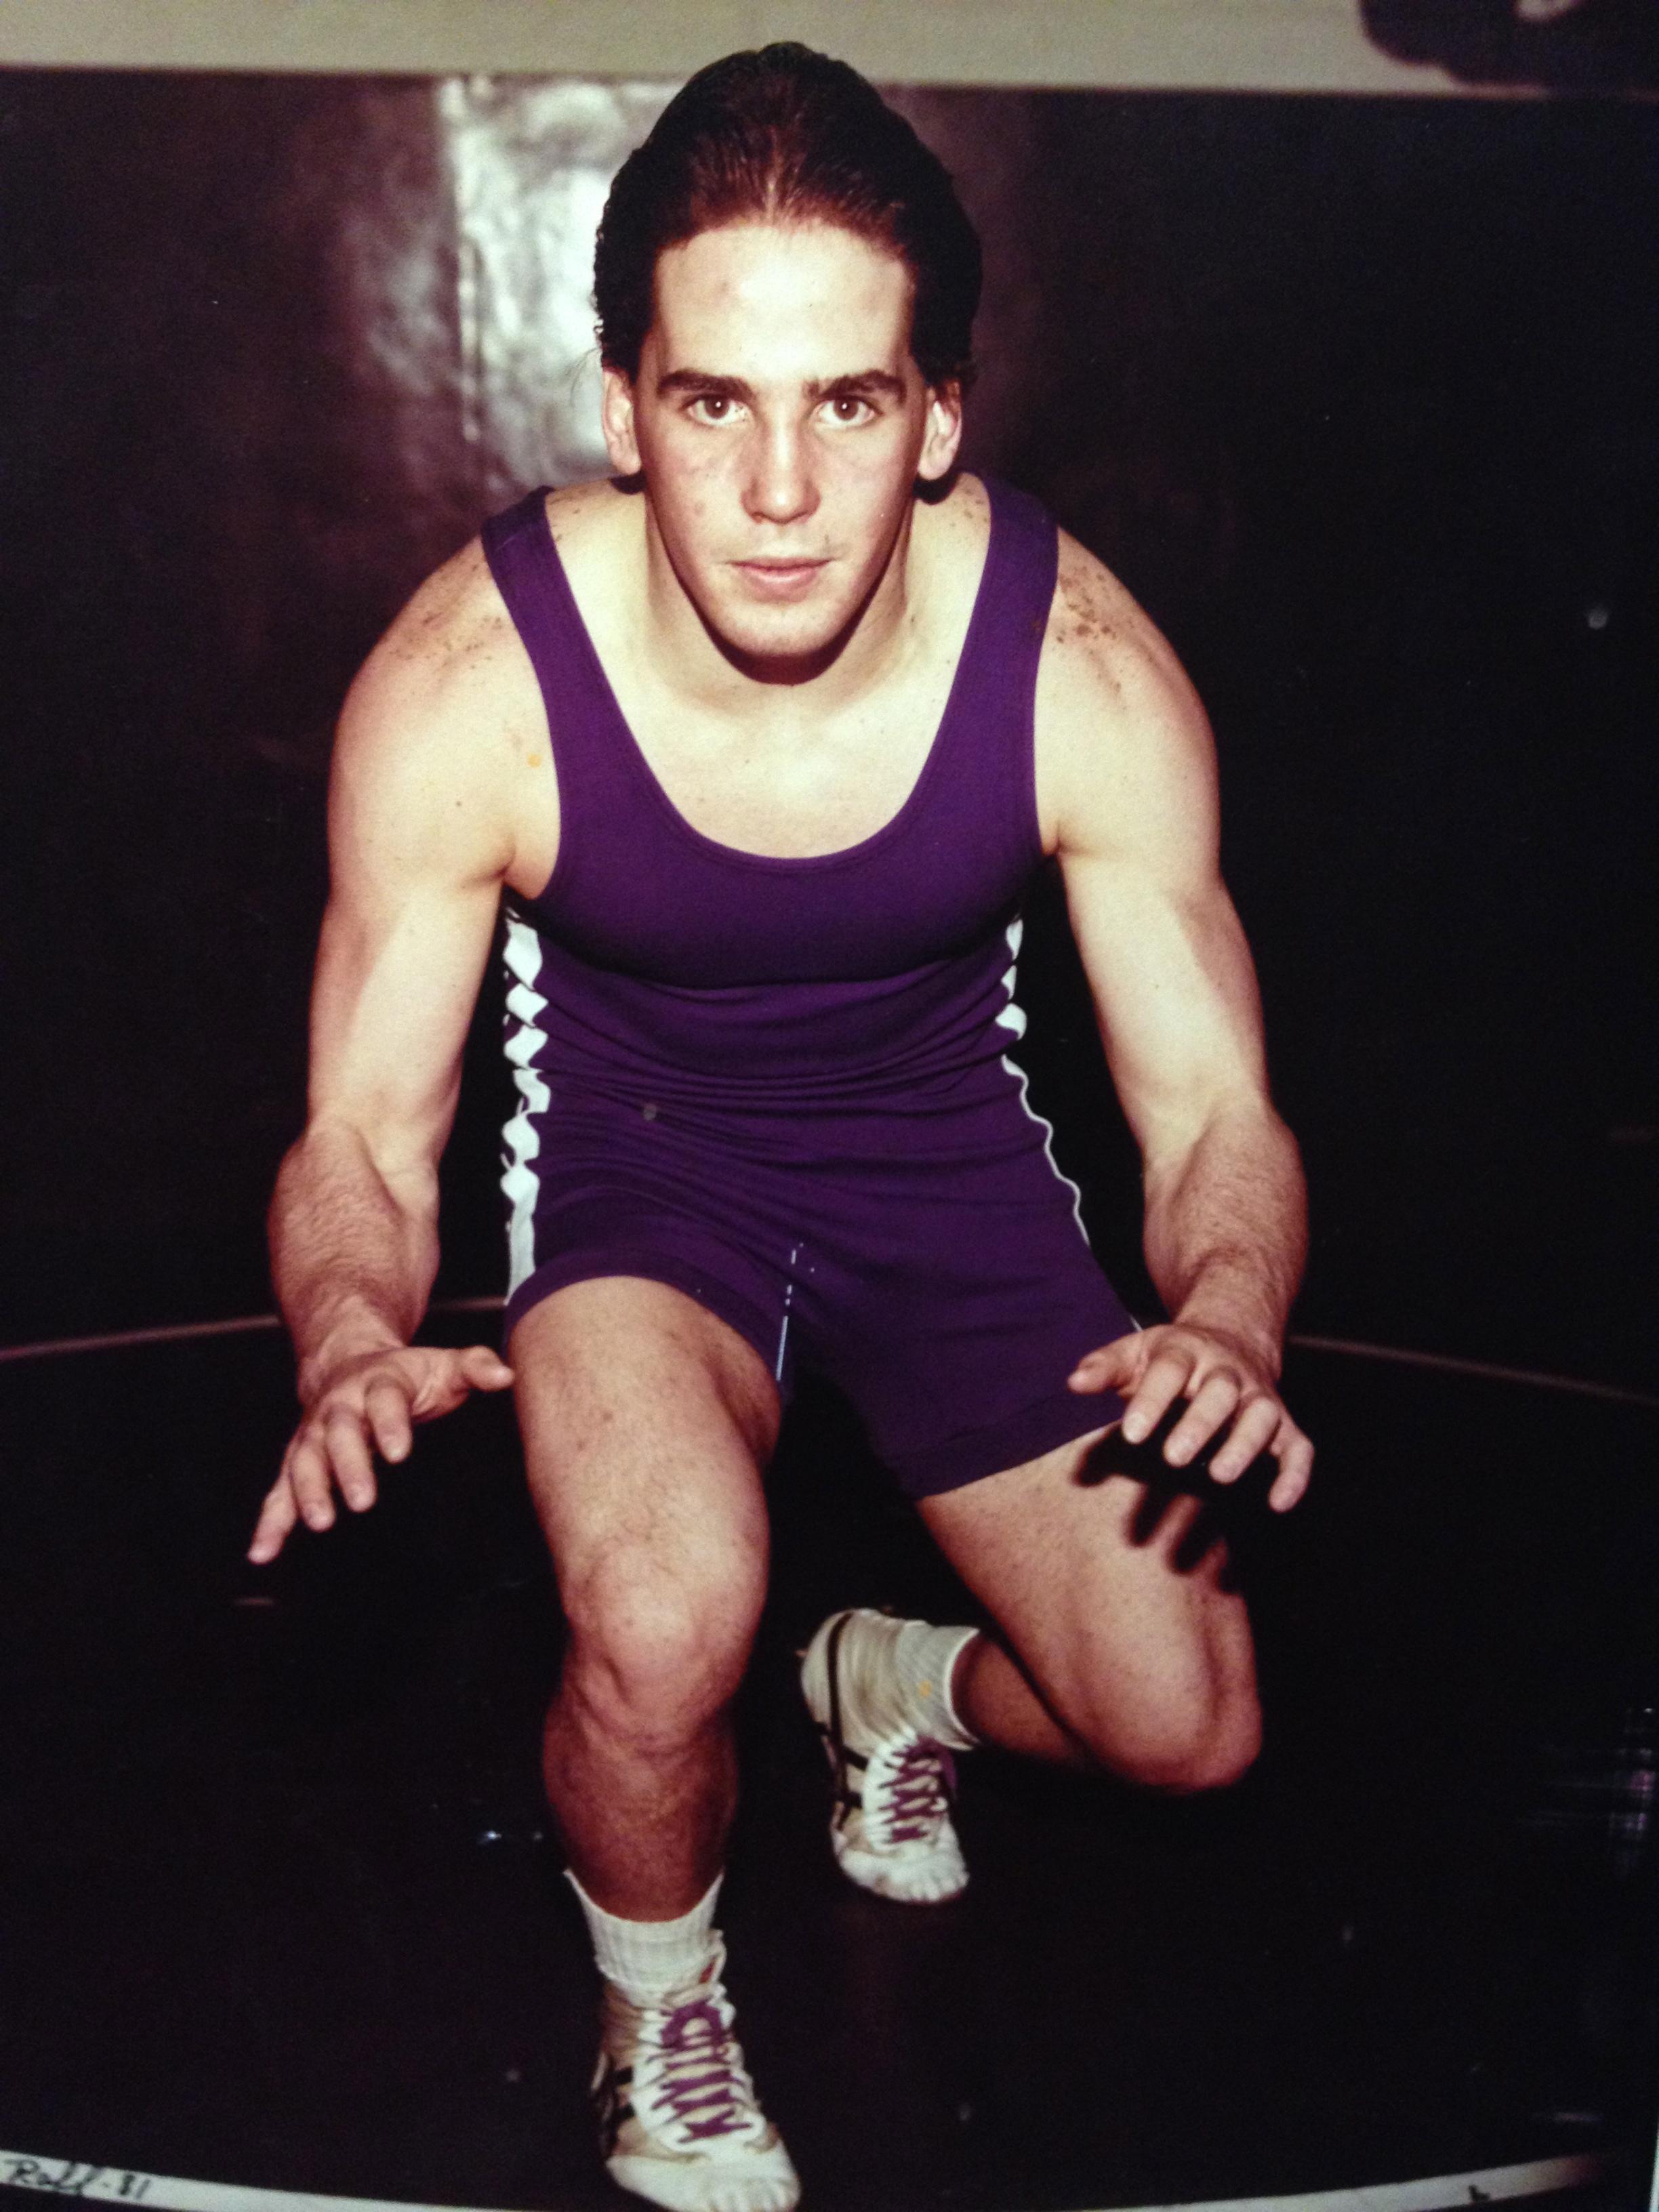 1982 STATE CHAMPION  Vince O'Brien, 185 Pounds